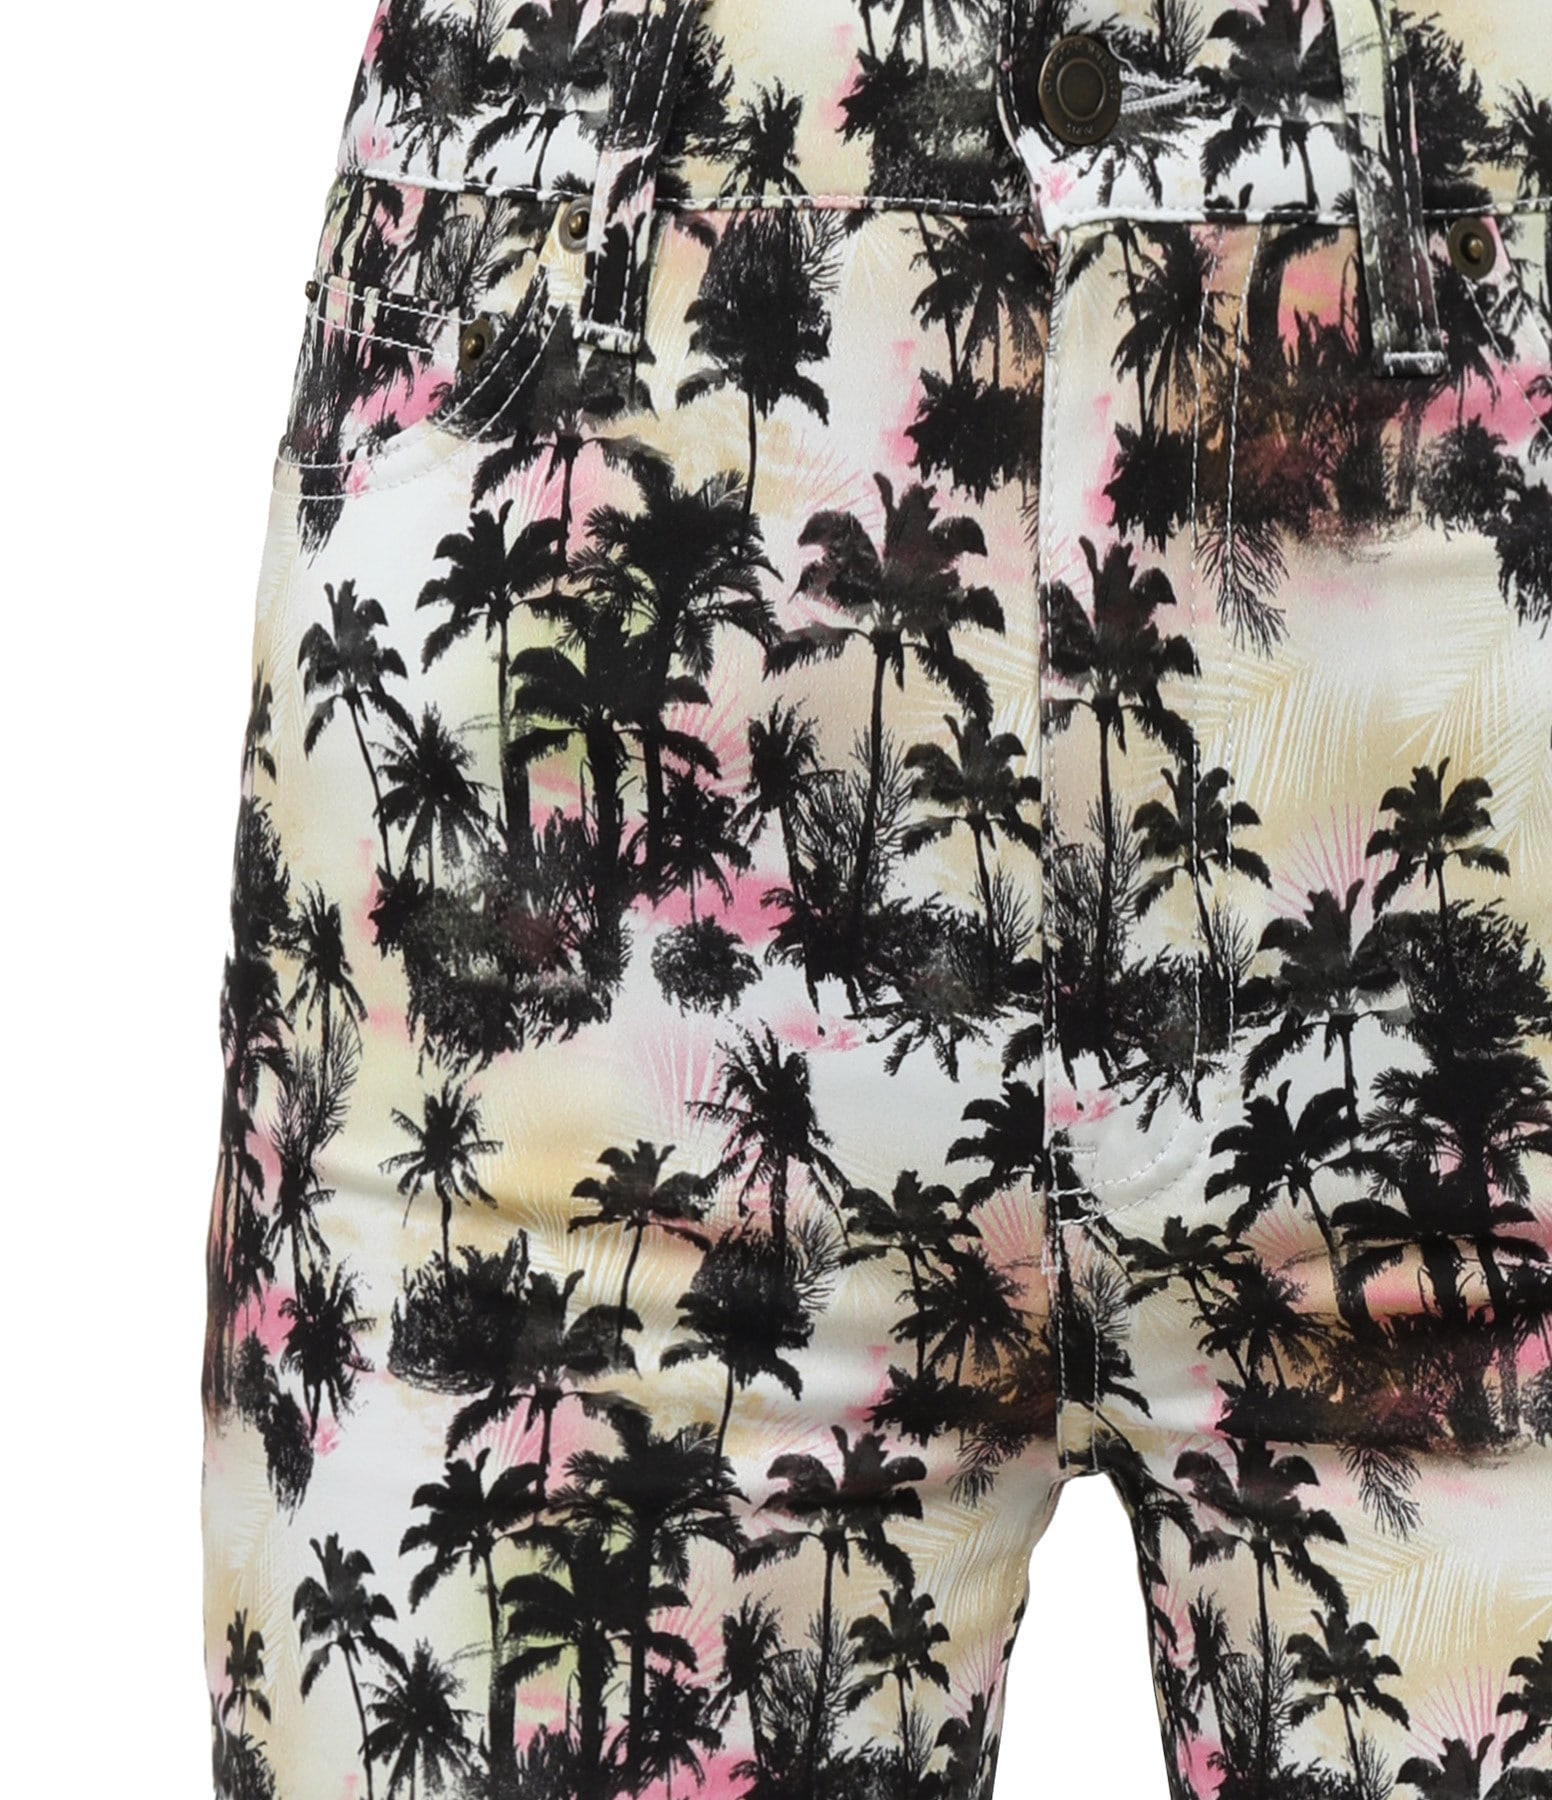 GARCONS INFIDELES - Pantalon California Mulitcolore